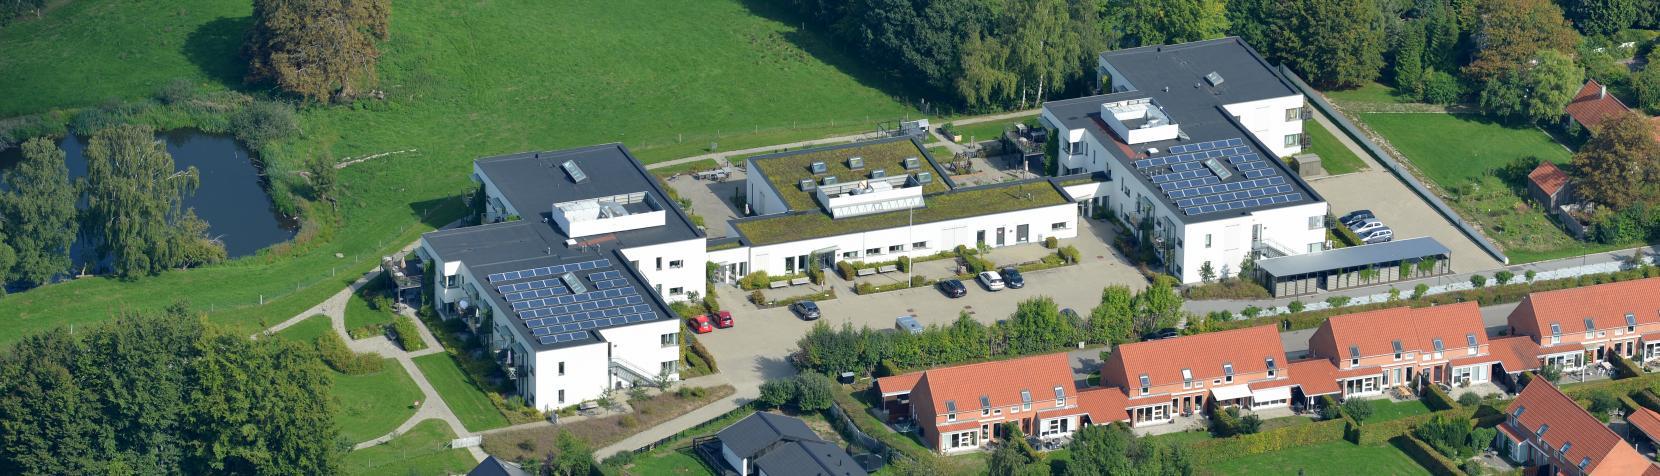 Bistrupvang Luftfoto (2)